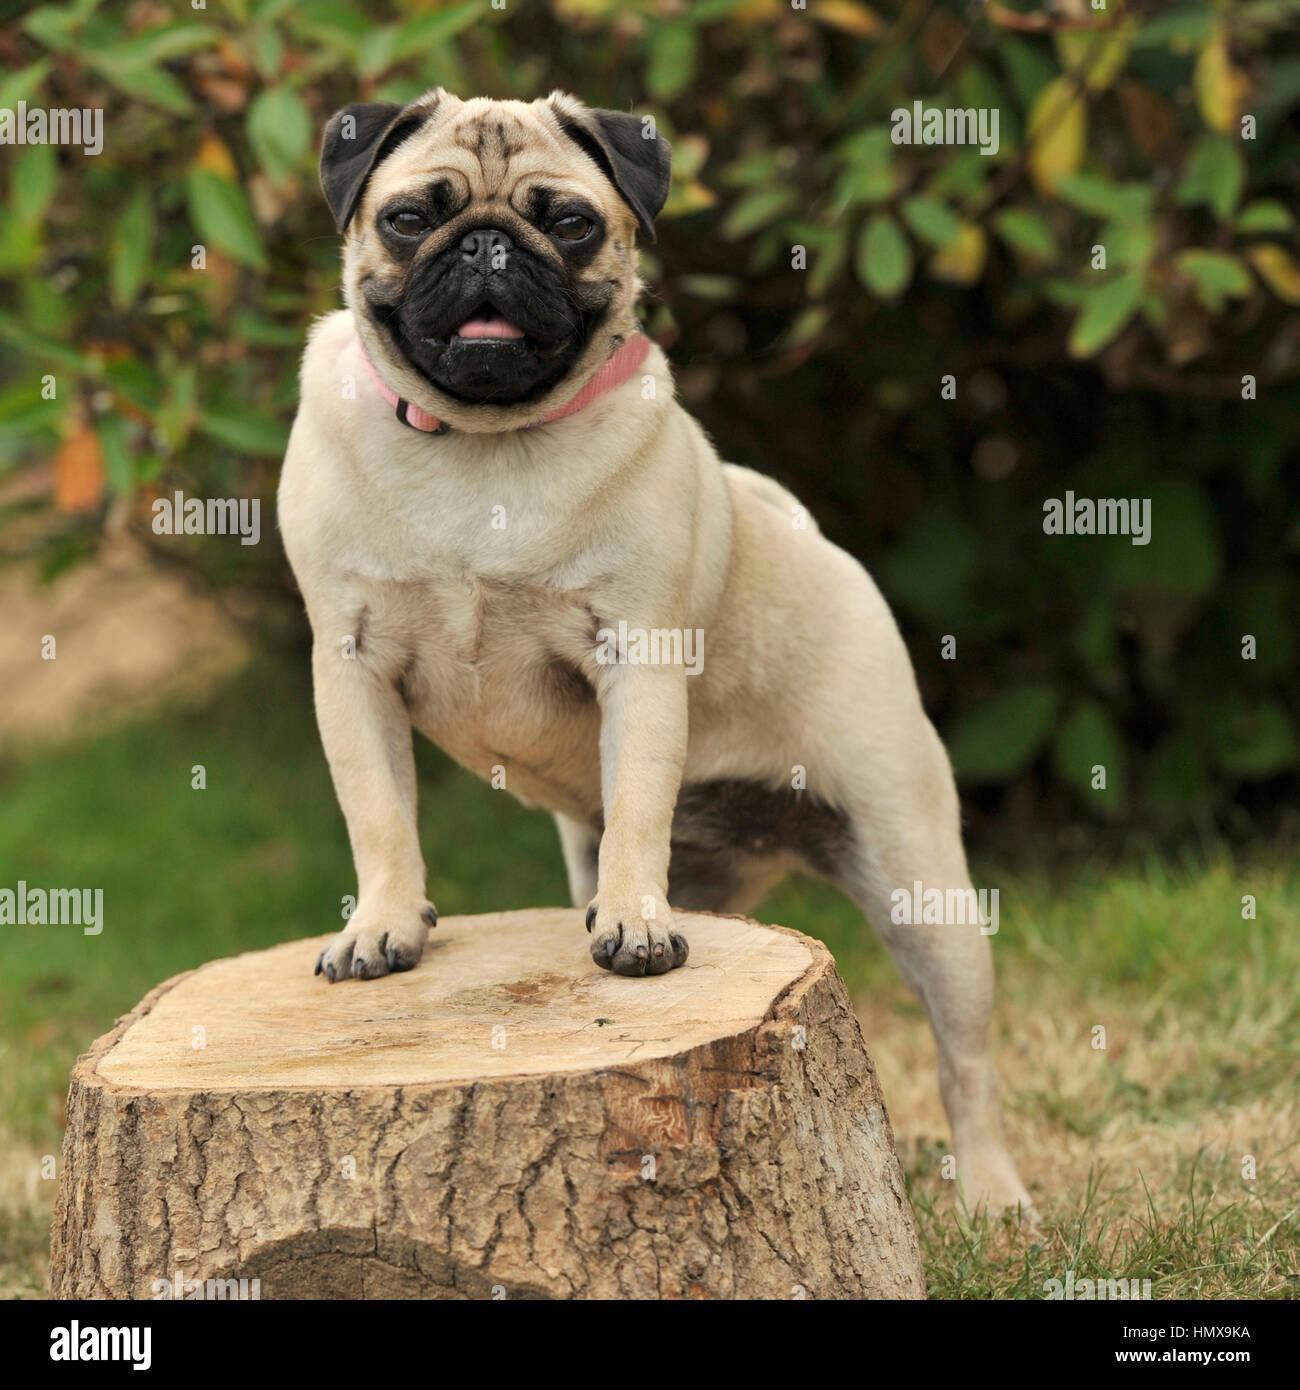 fawn pug - Stock Image